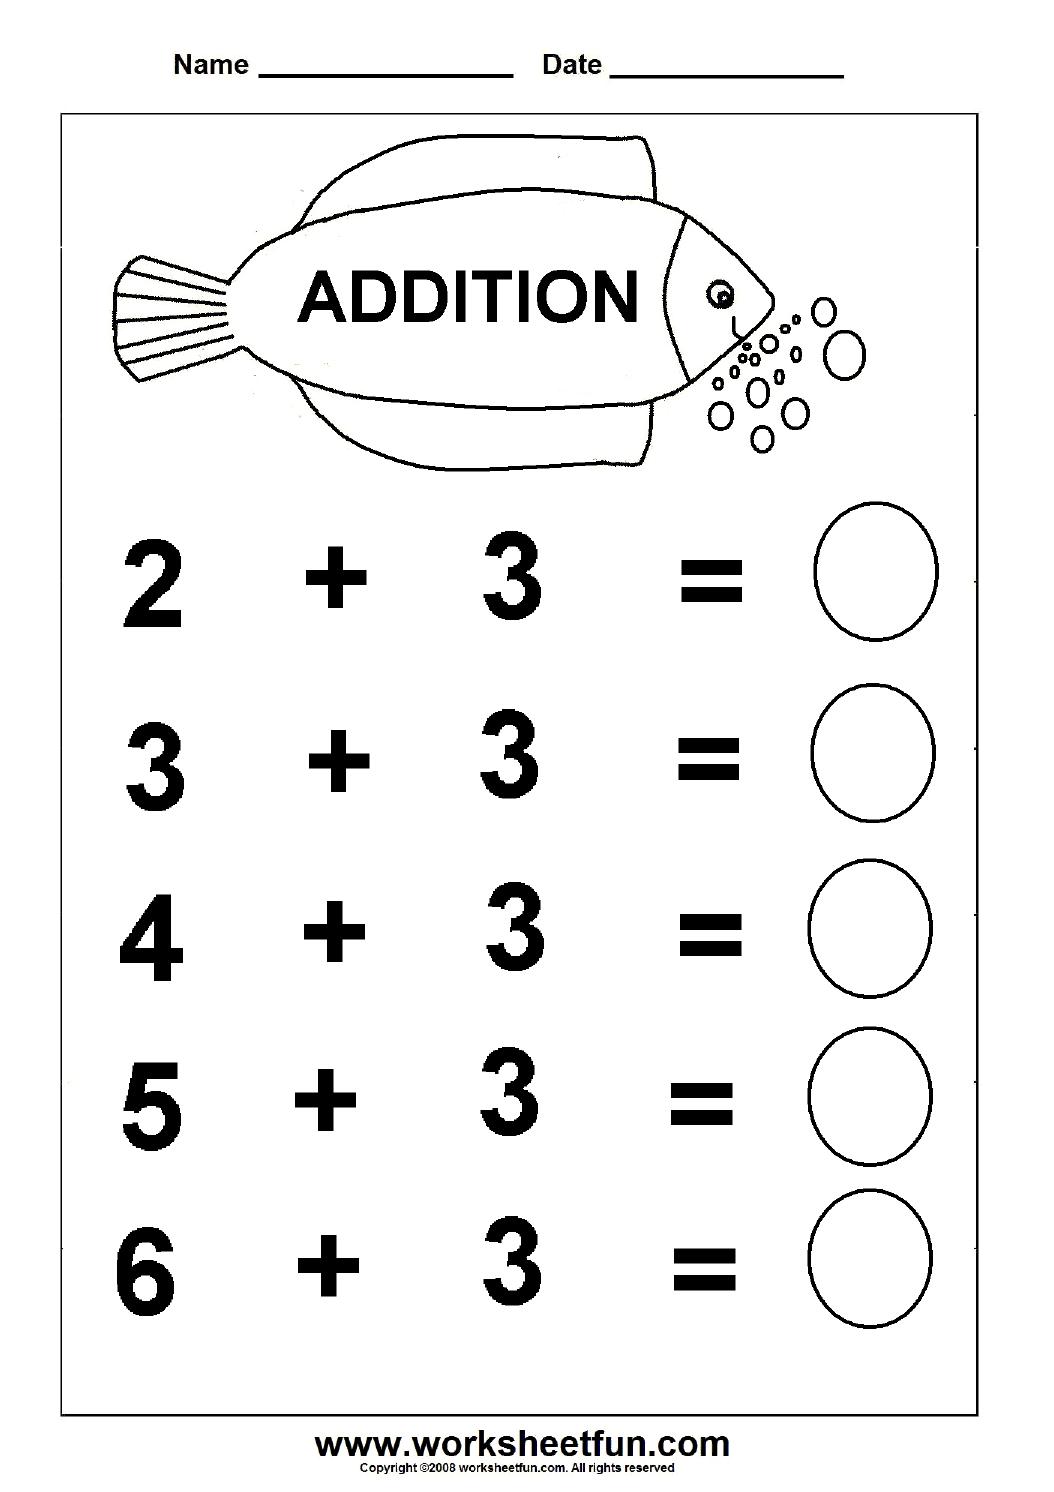 Beginner Addition – 6 Kindergarten Addition Worksheets   Free